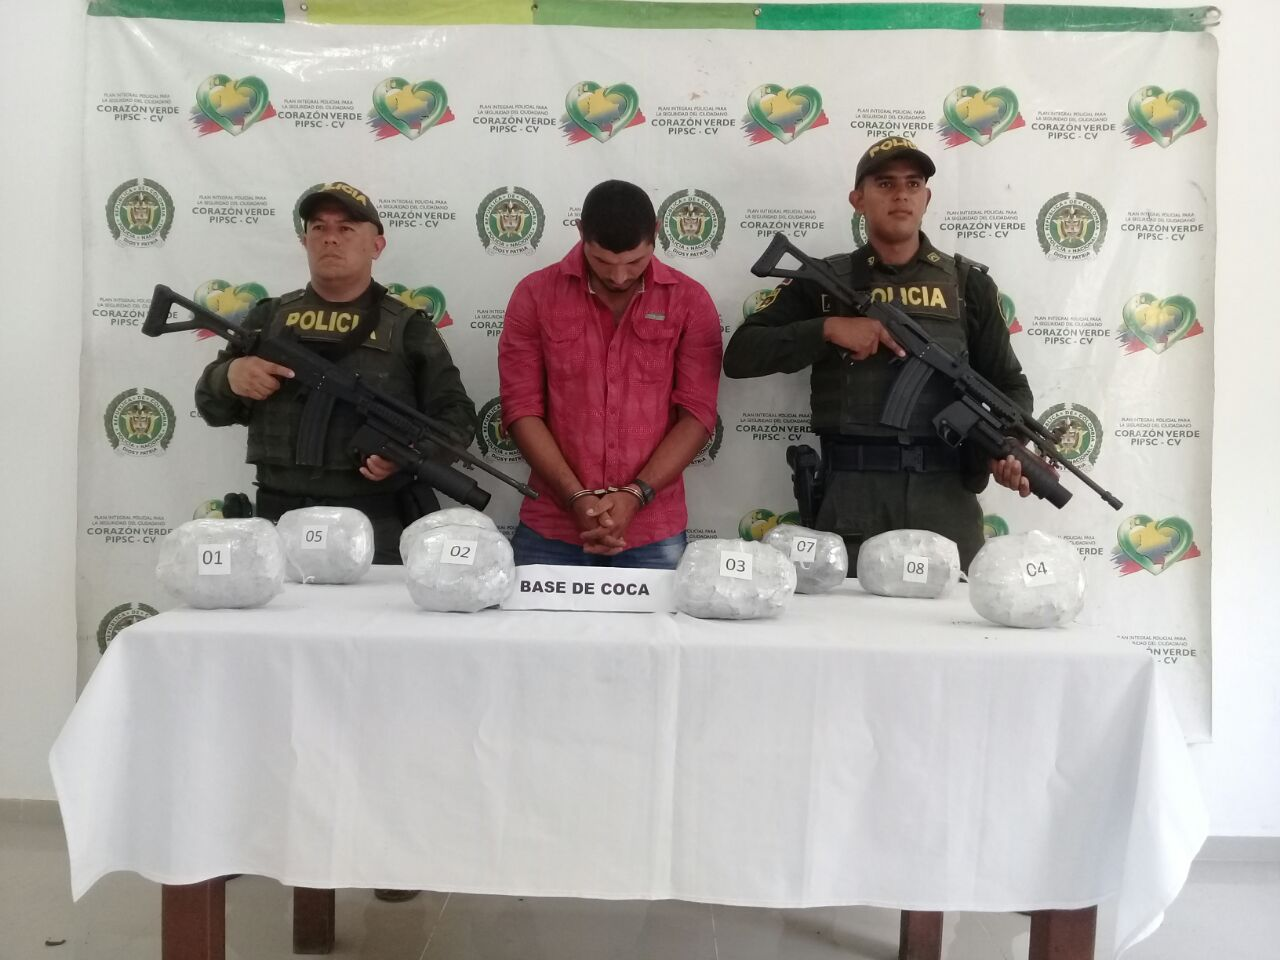 Capturado por tráfico de estupefacientes en Puerto Libertador